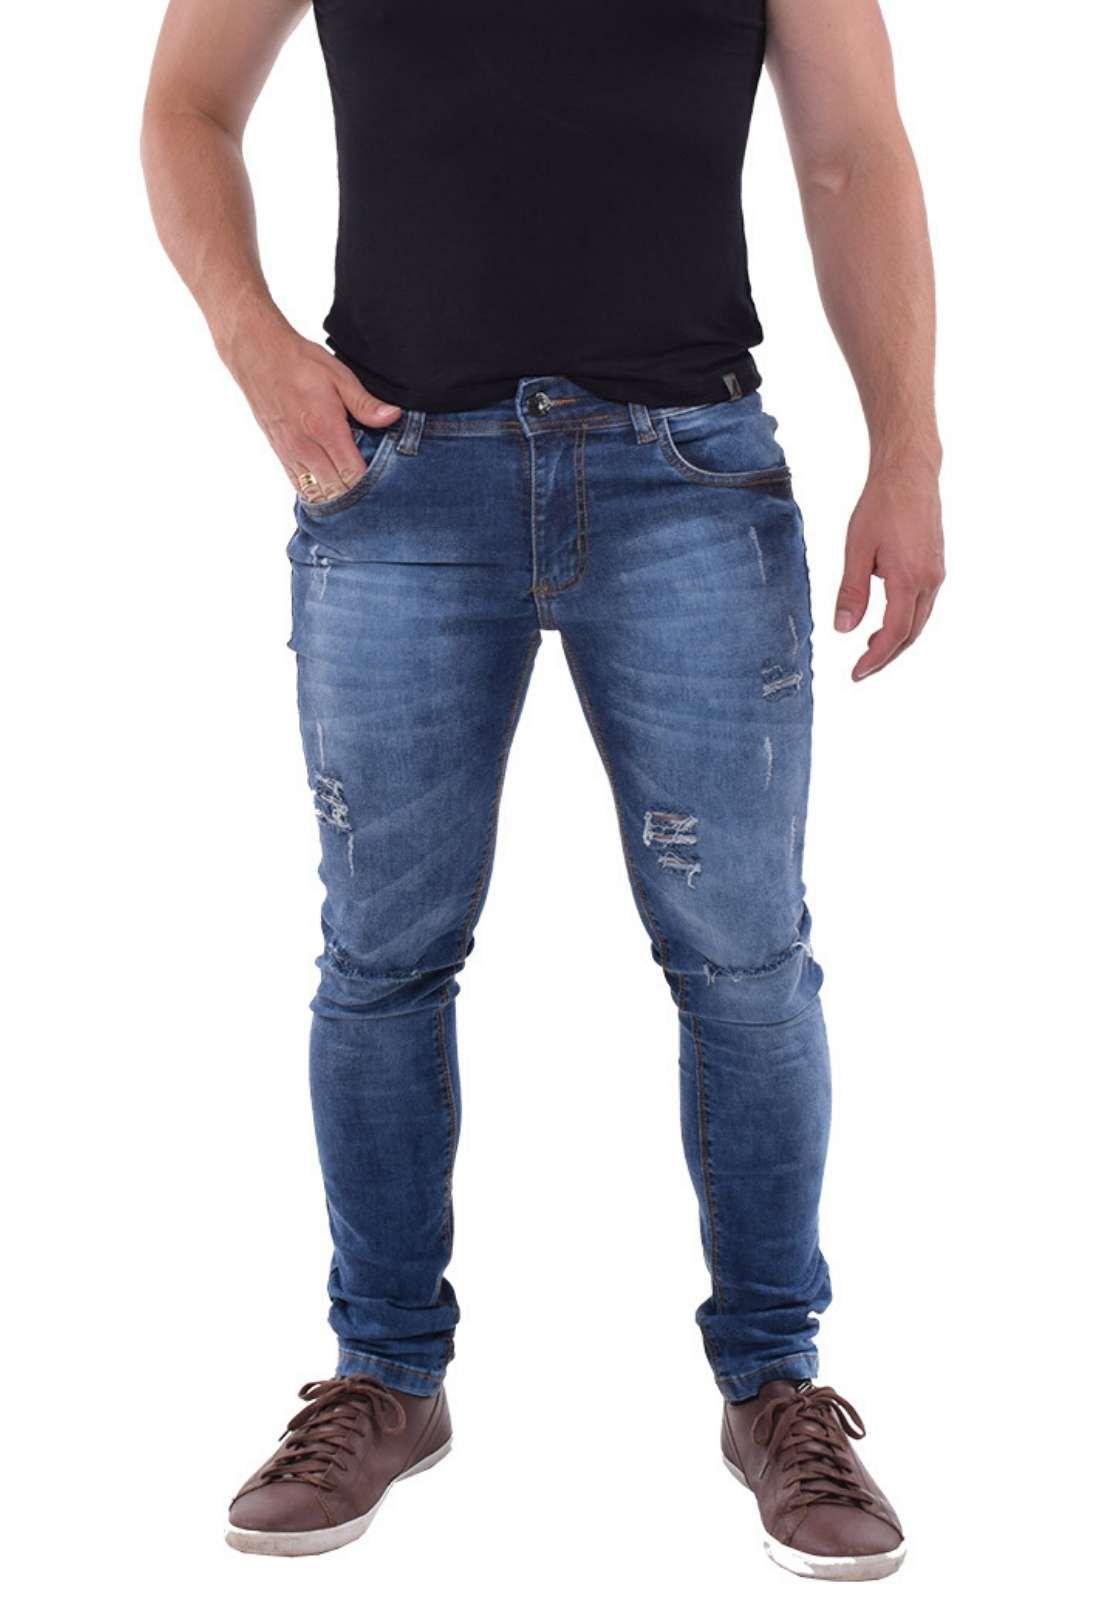 Calça Masculina Jeans Lavado 700303